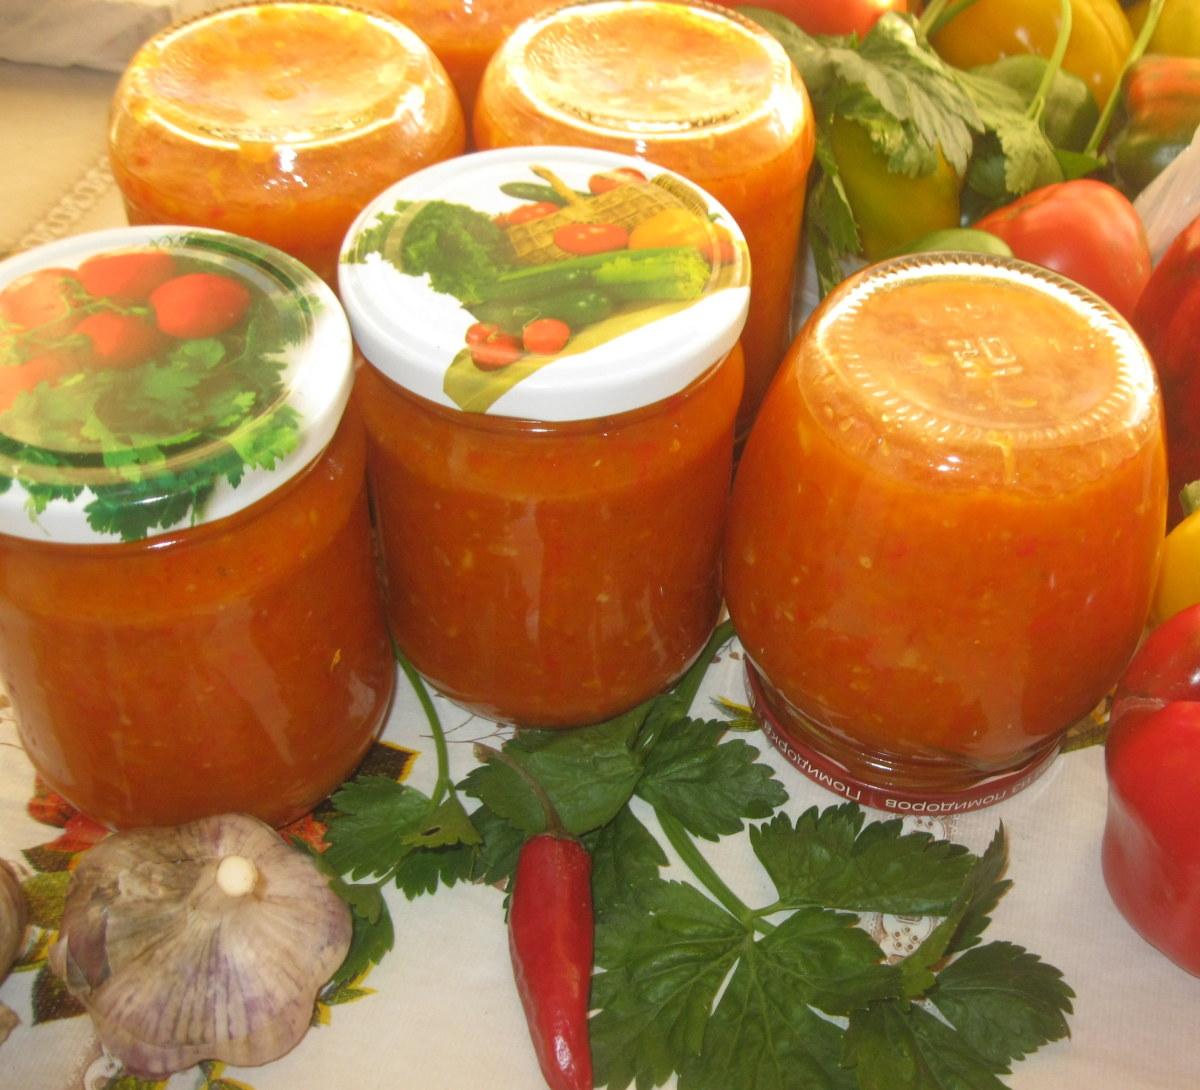 Тещин язык из кабачков – топ-4 рецепта с фото на зиму (без стерилизации)